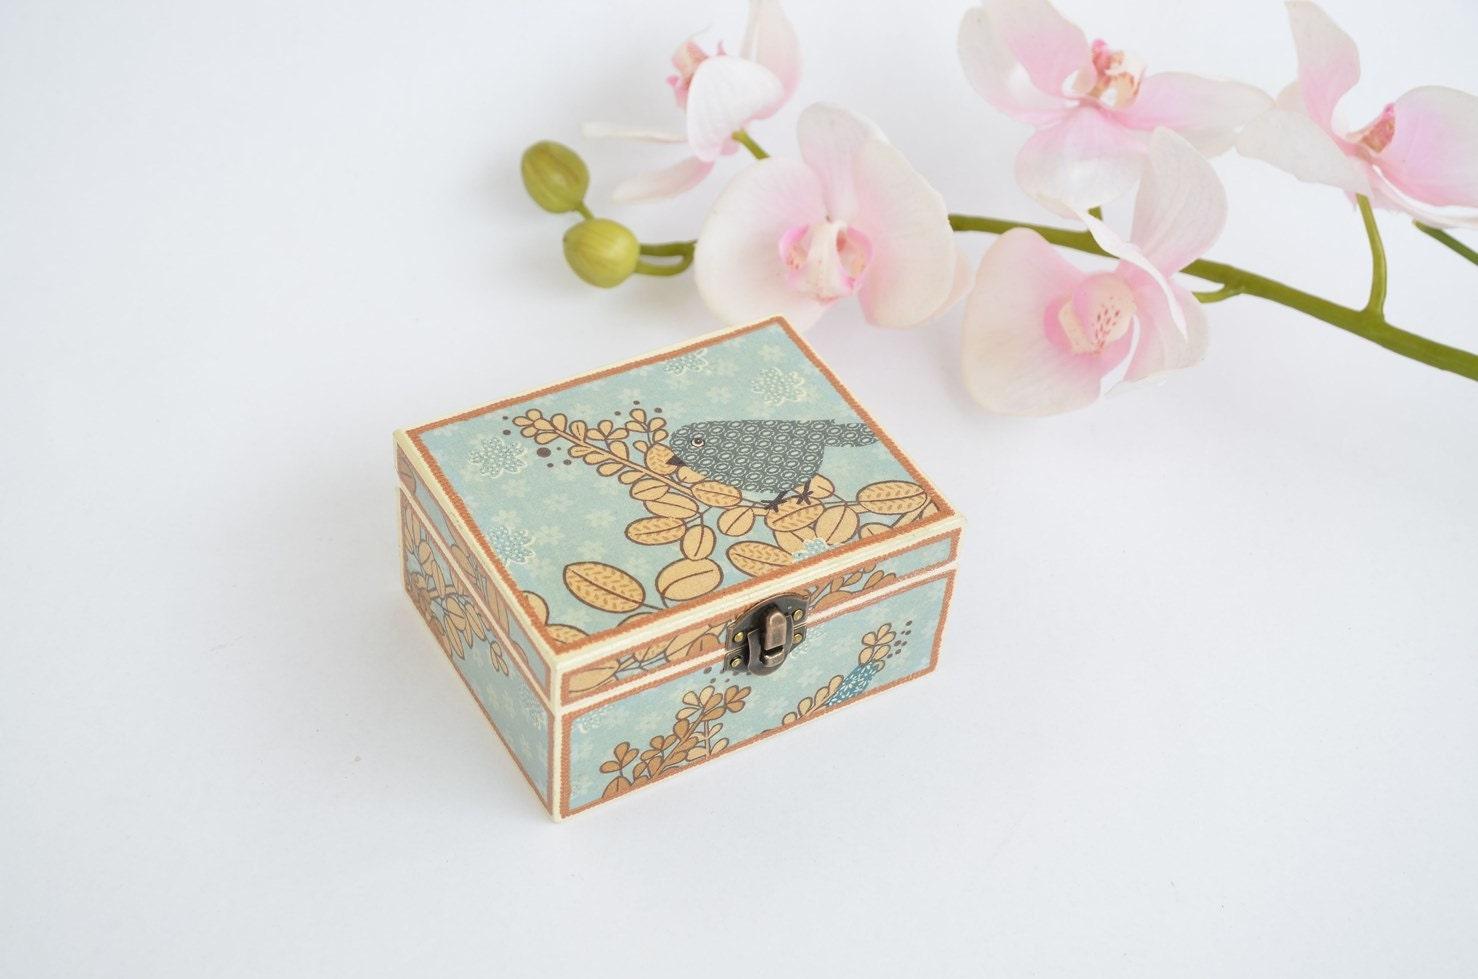 Decorative Jewelry Boxes Ideas : Small decoupaged jewelry box ring bird decor wooden